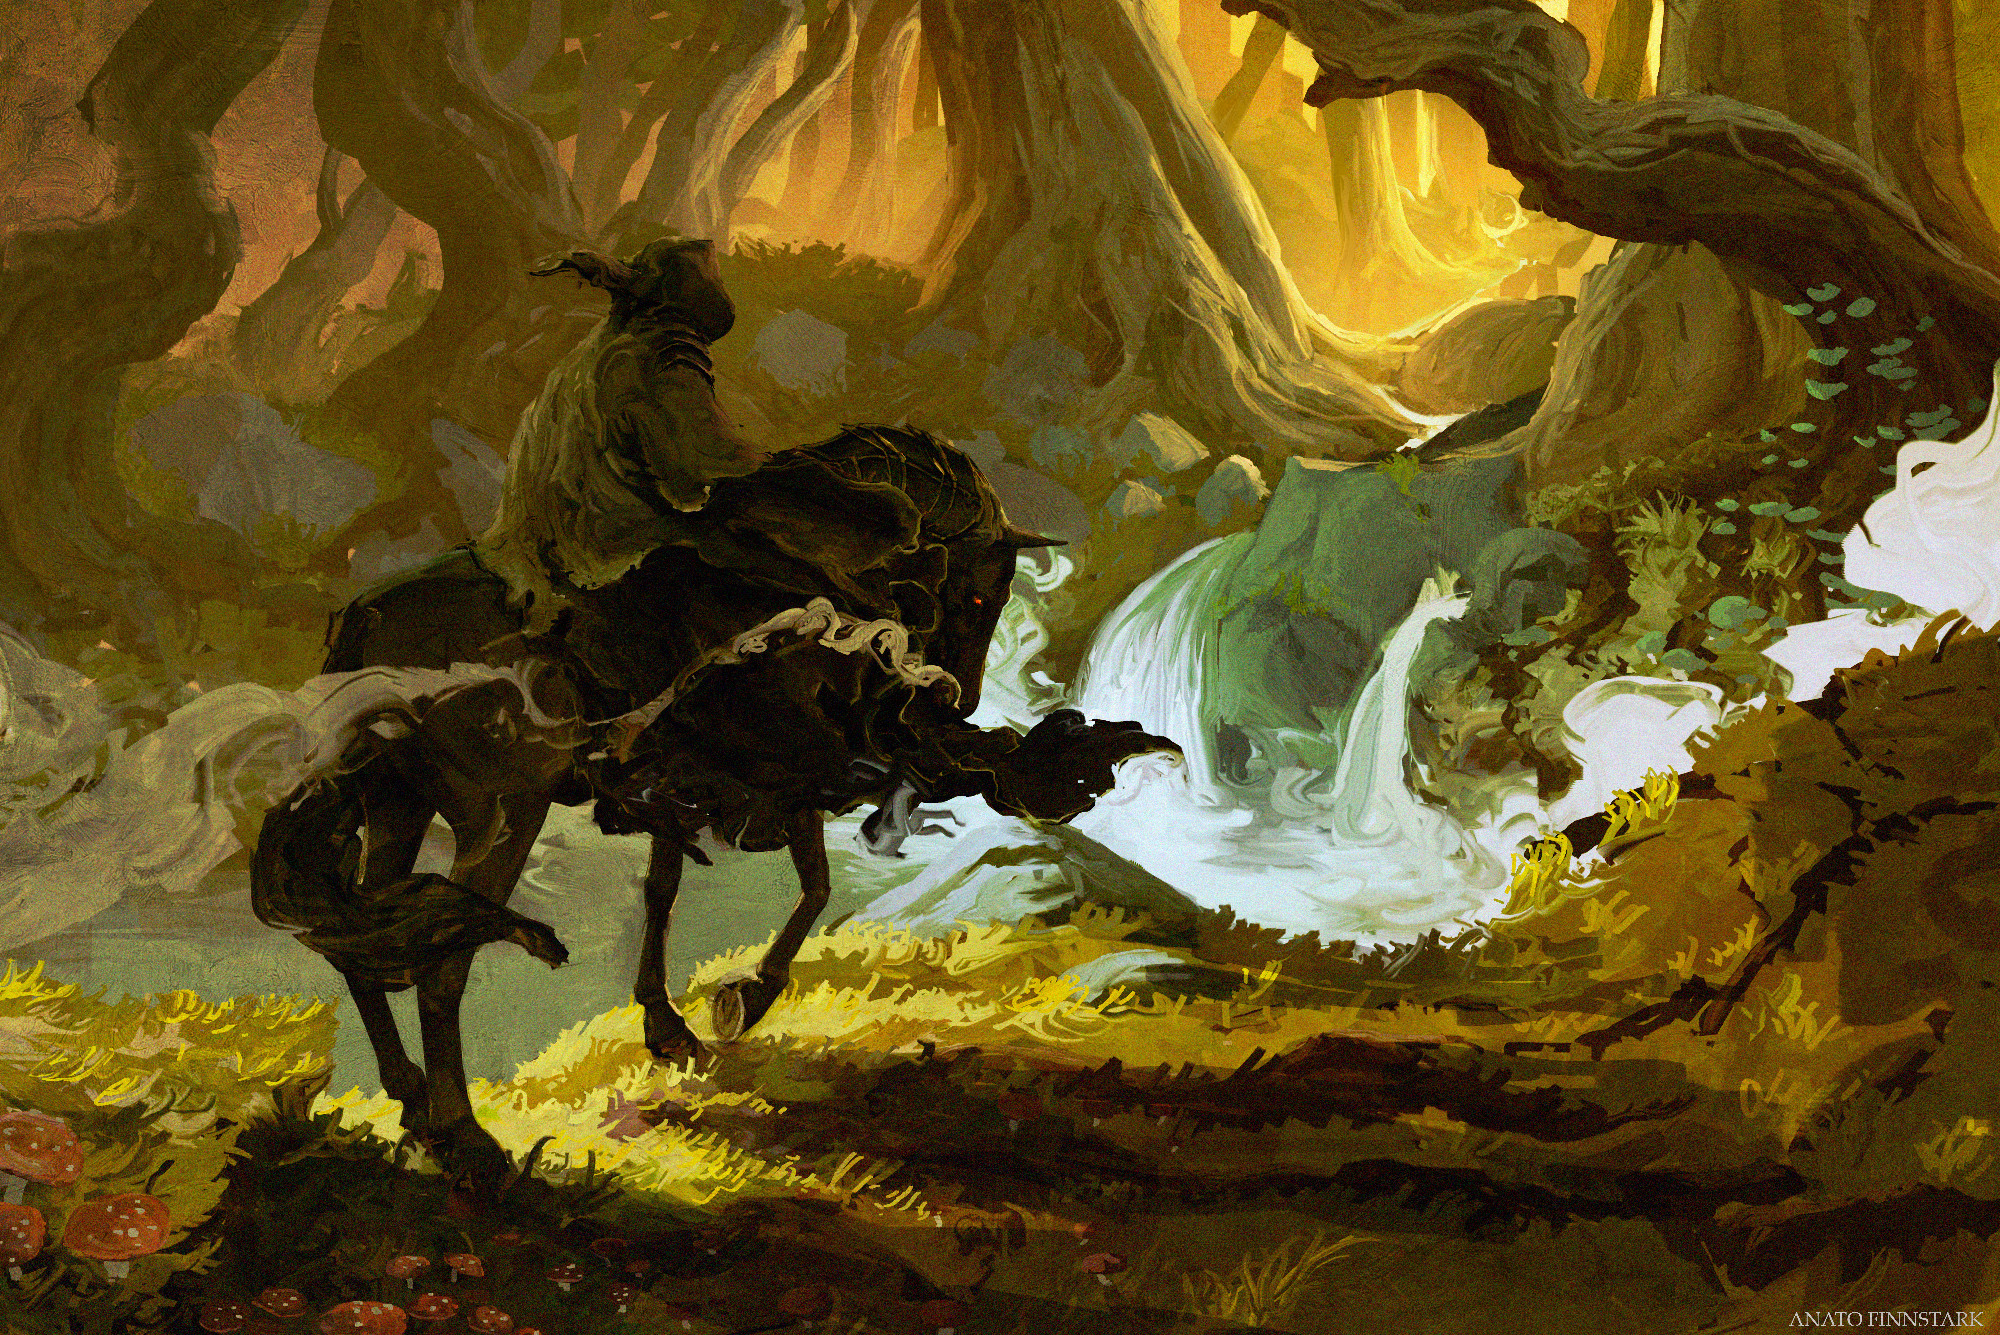 Nazgûl hunting